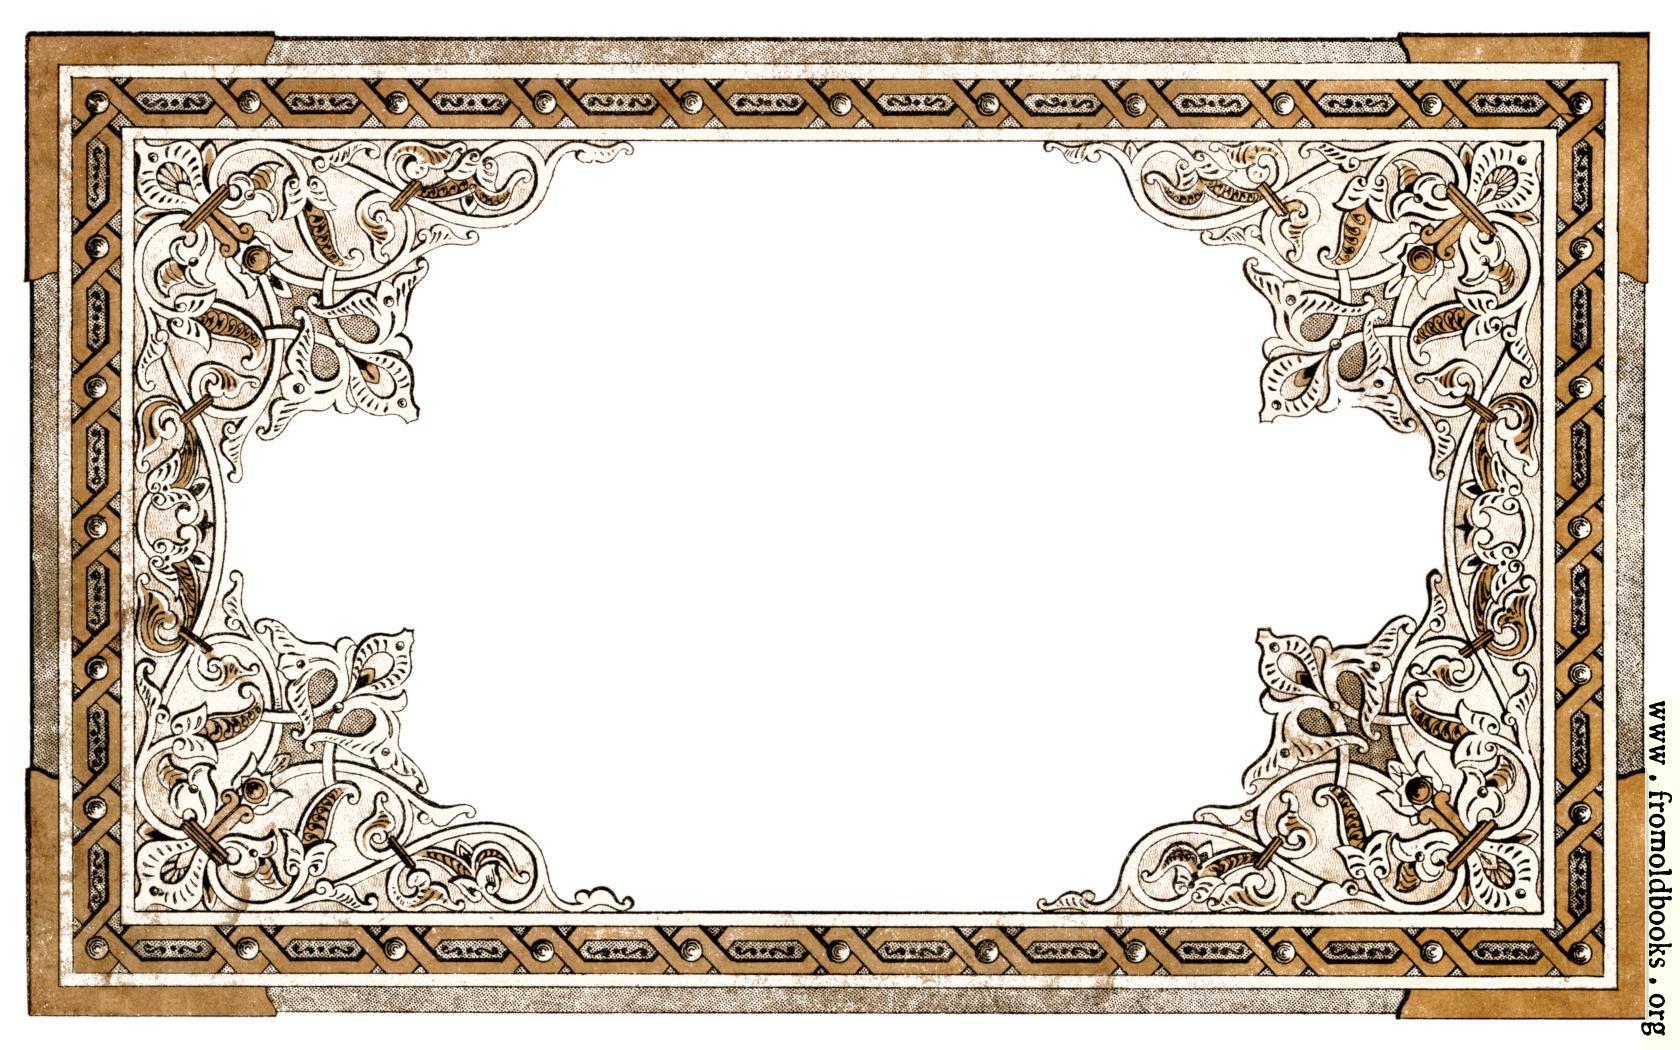 vintage shabby chic ornate full page border 1680x1050 326k jpg